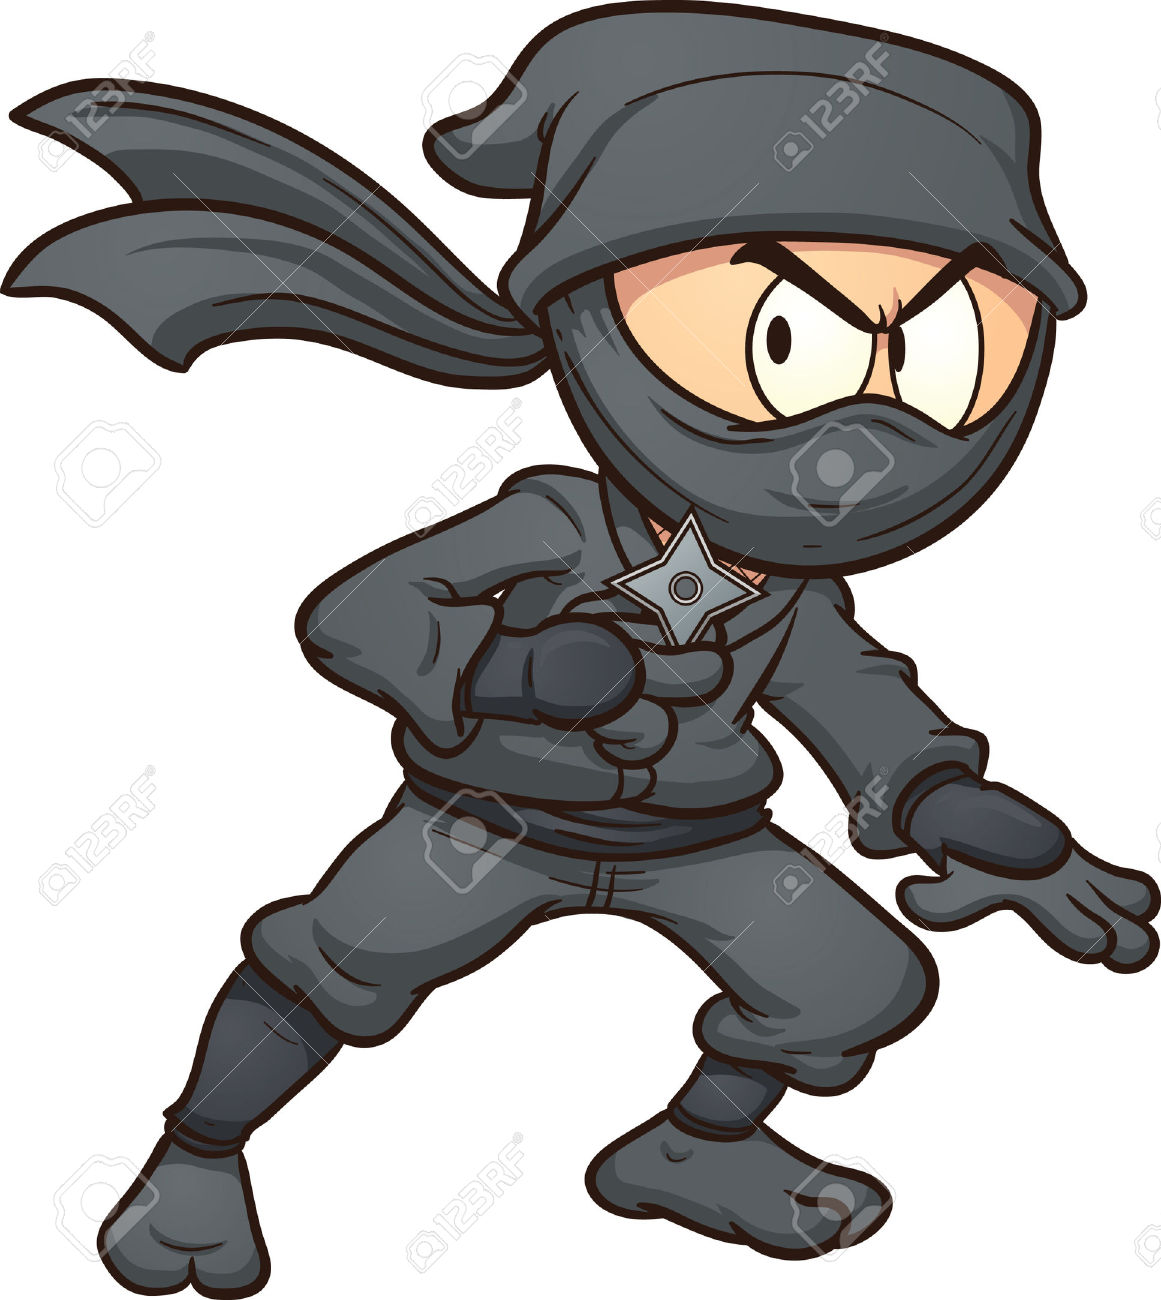 Ninjas clipart #2, Download drawings